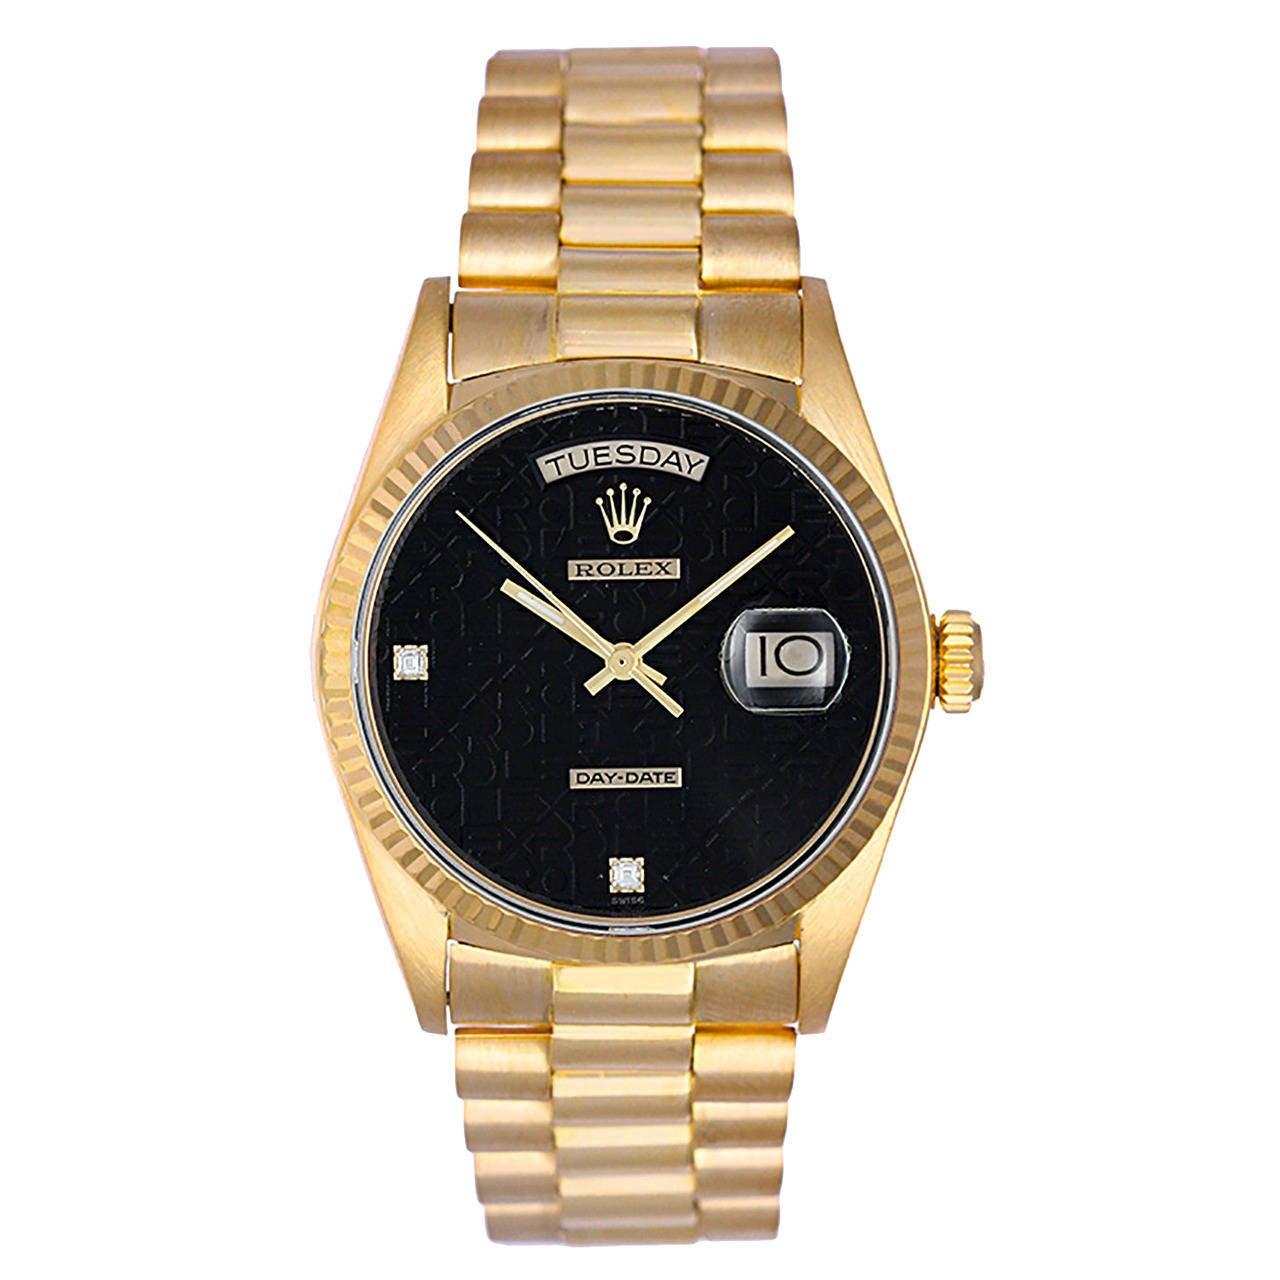 Rolex Gold Day-Date Black Jubilee Dial President Wristwatch Ref 18038 1